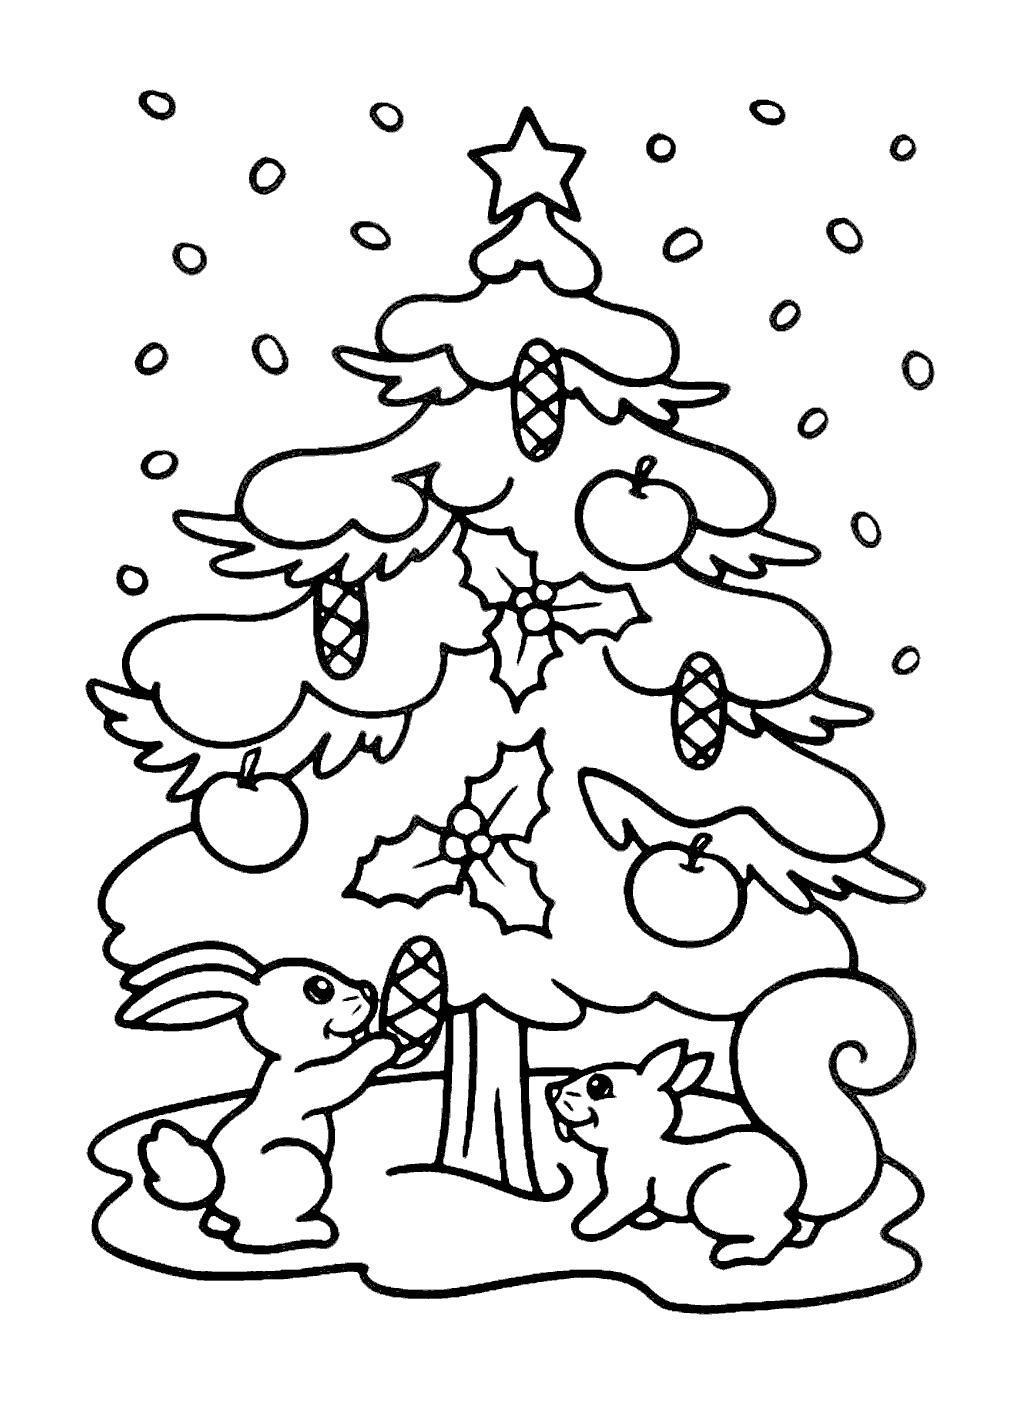 Белка Новогодняя елка Рисунок раскраска на зимнюю темуРаскраски про зиму